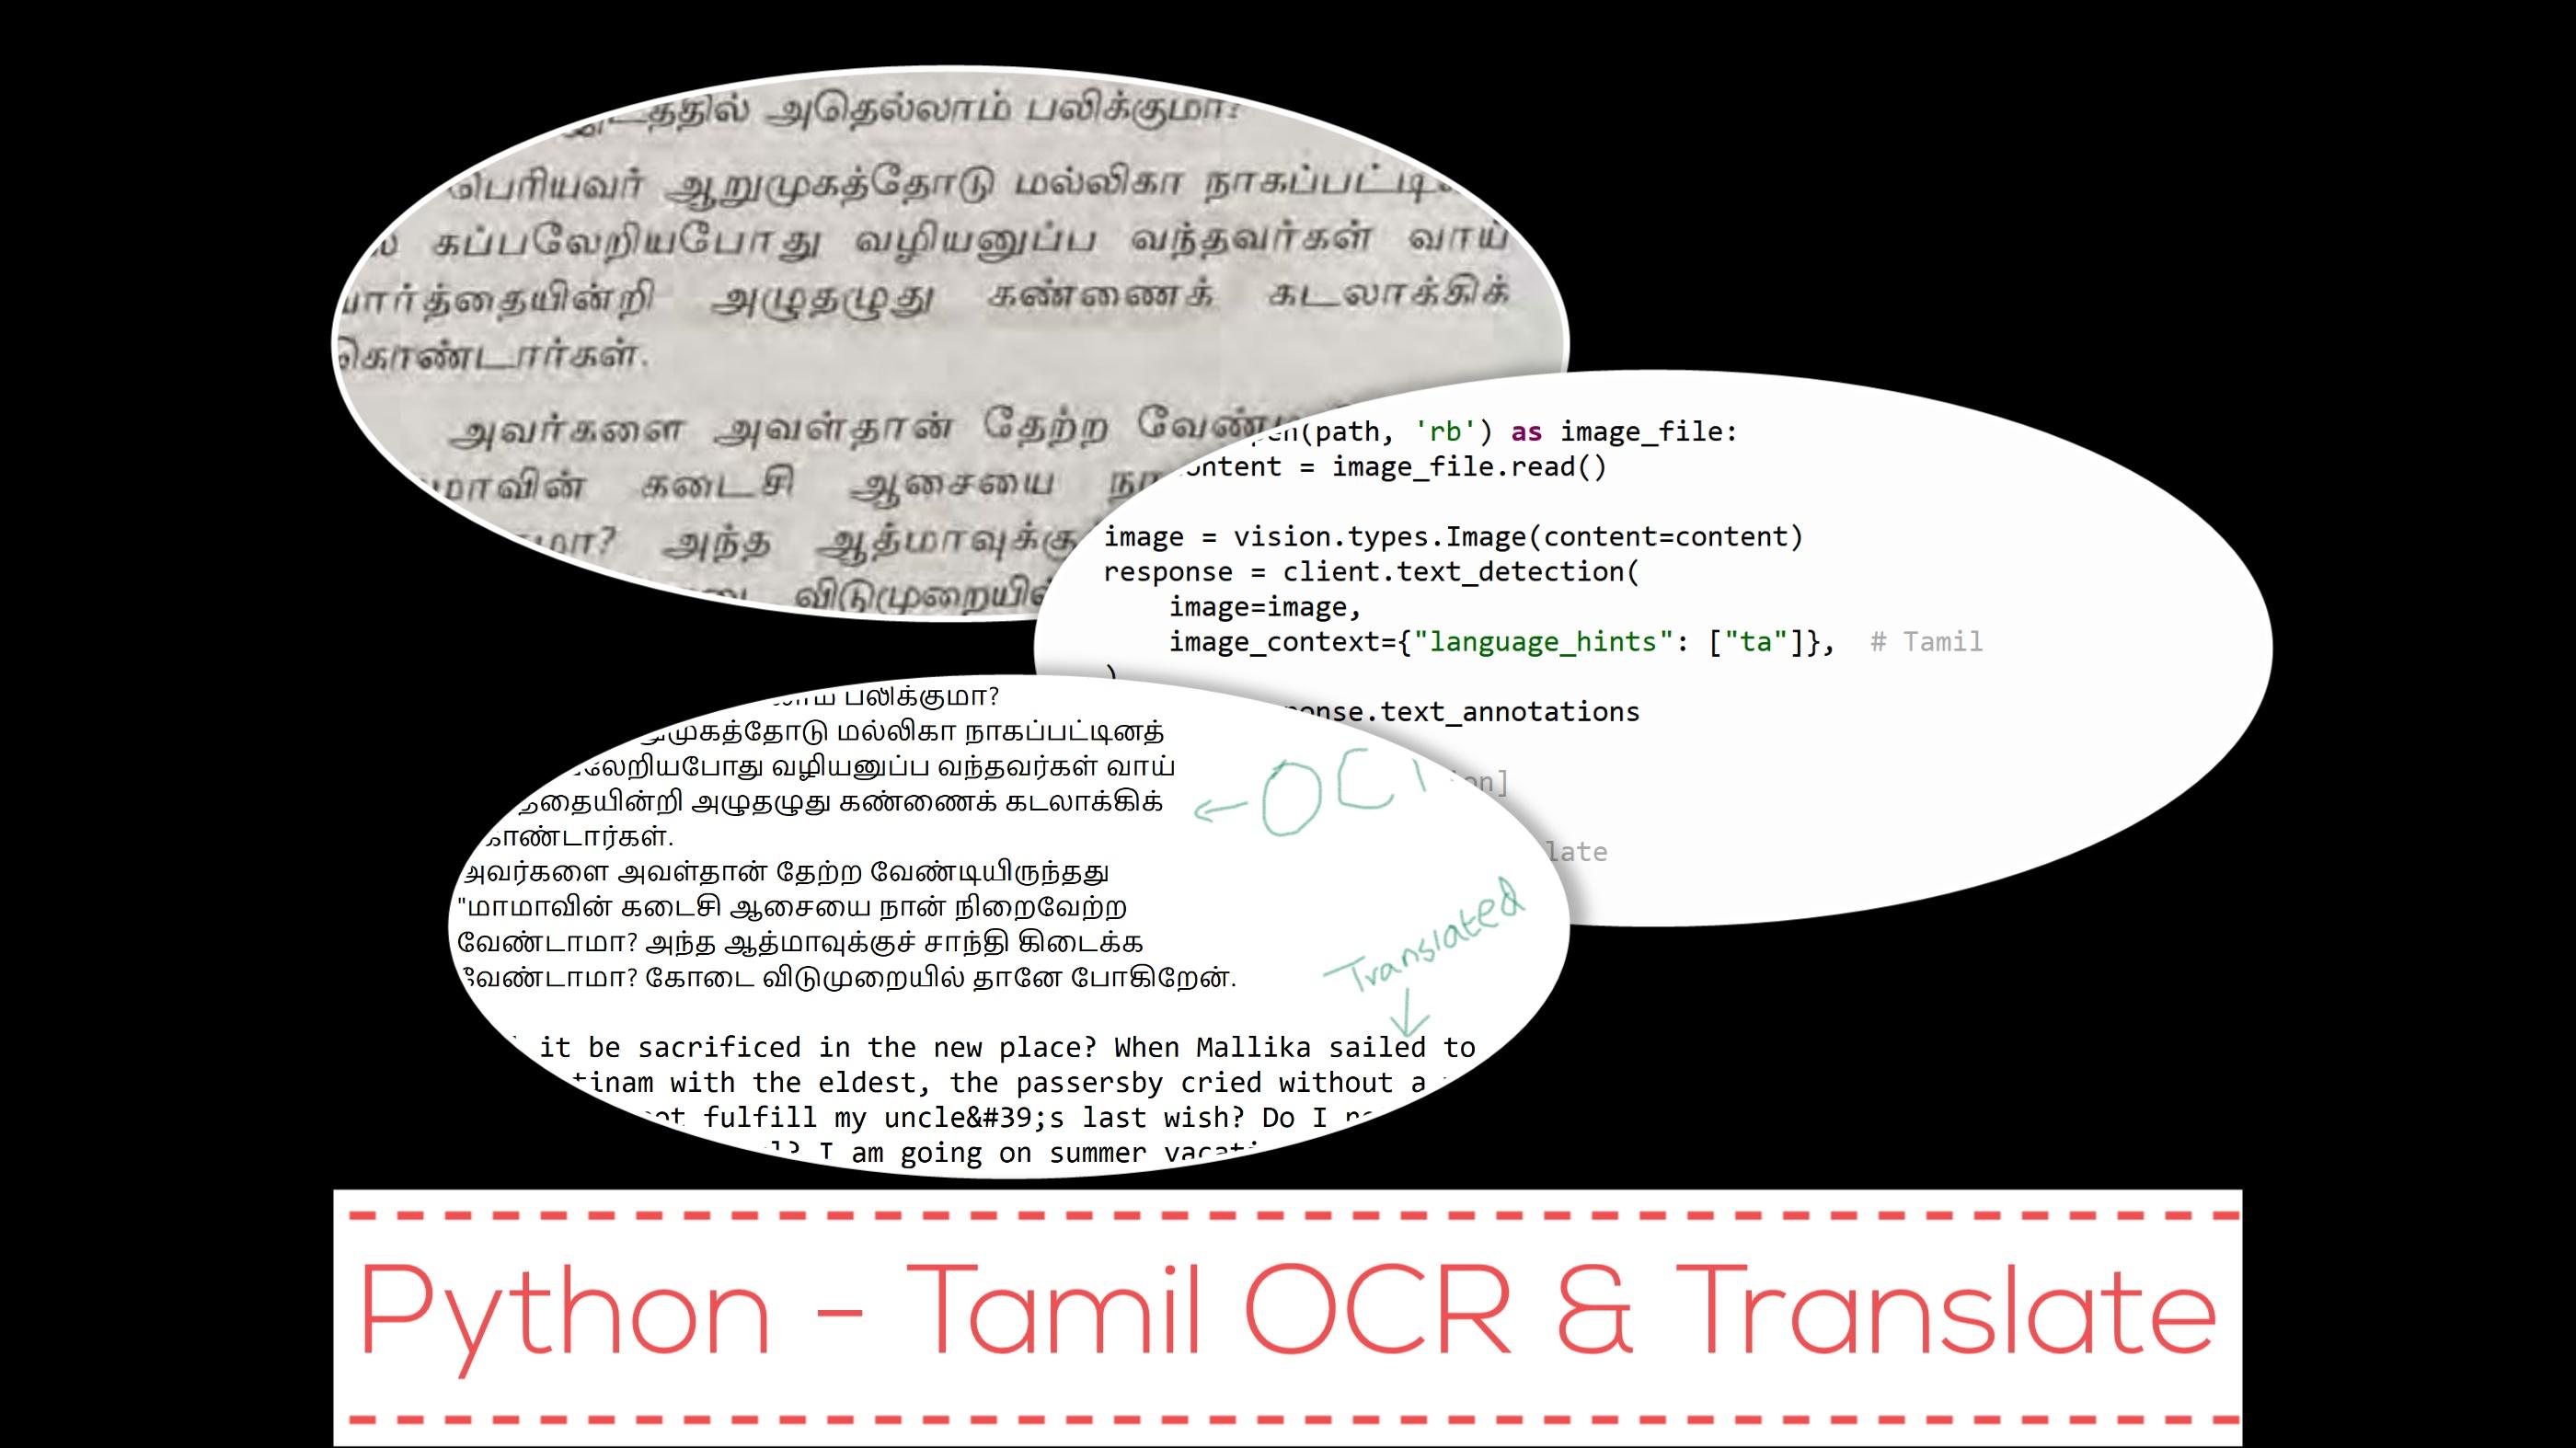 Python - Tamil OCR and Translate